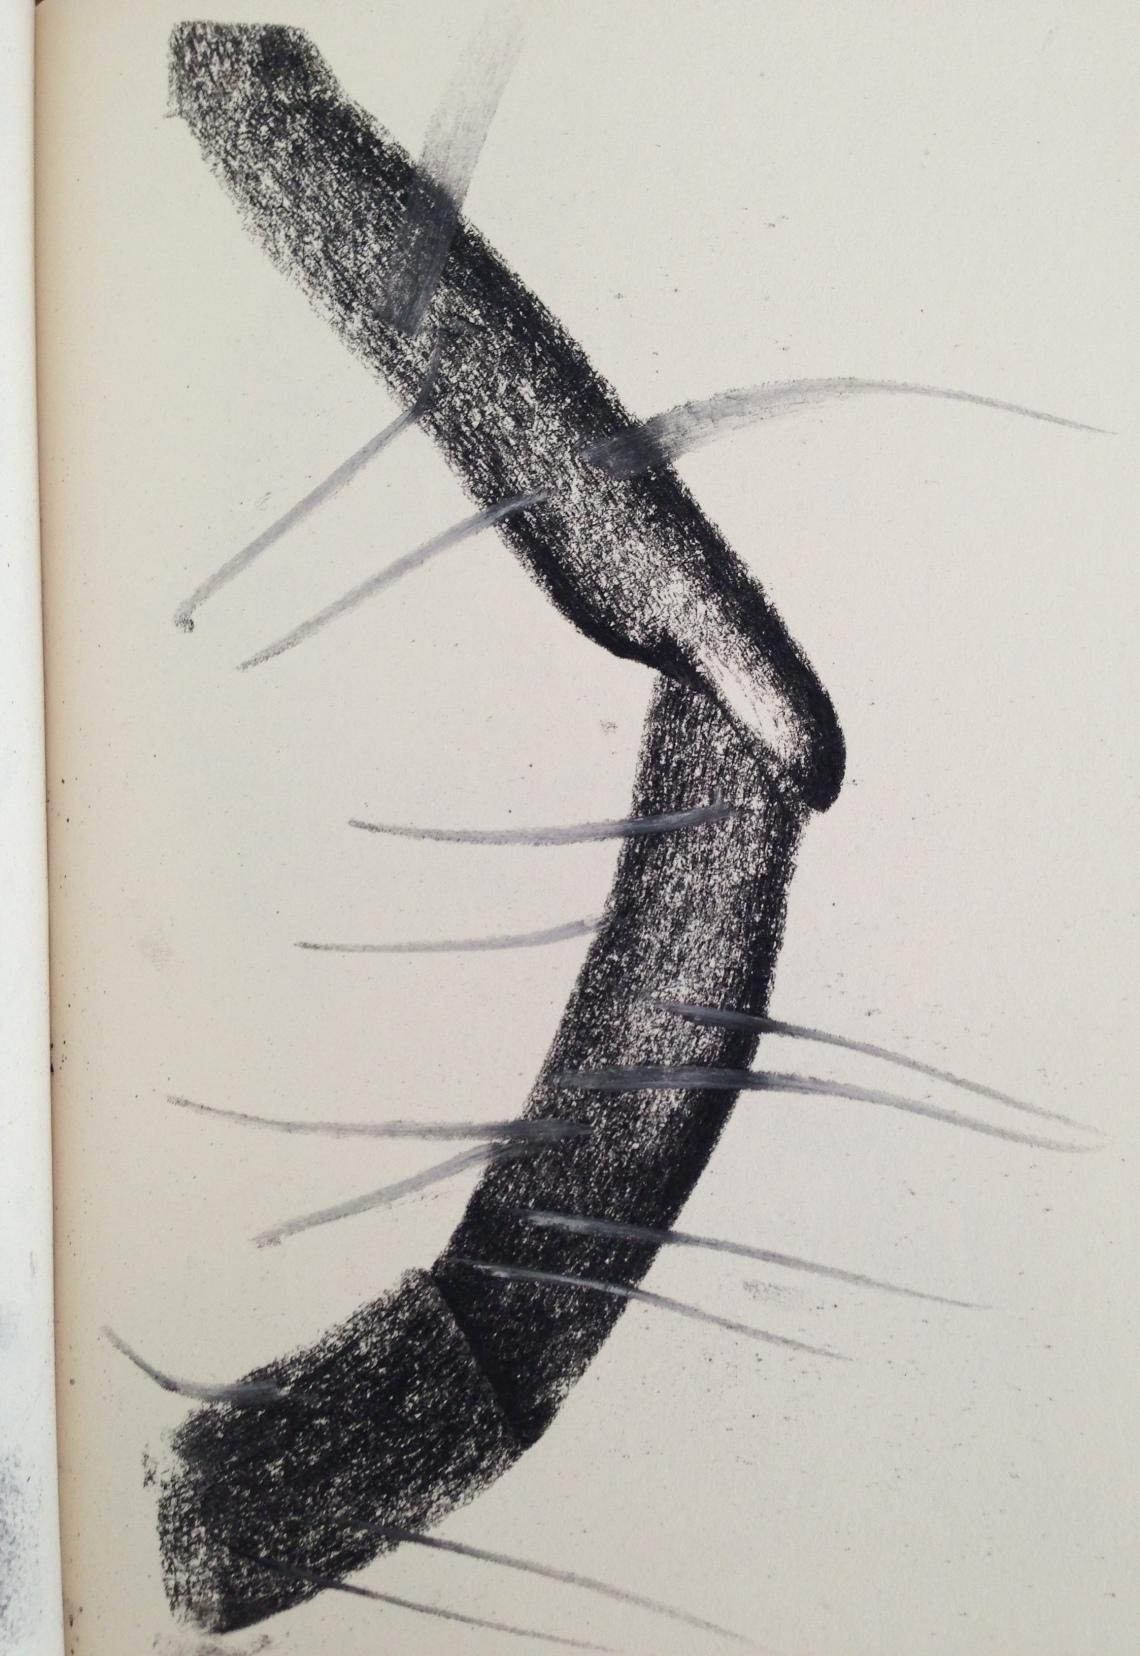 Sketchbook febrero-abril 2013, Laura Barbuto.